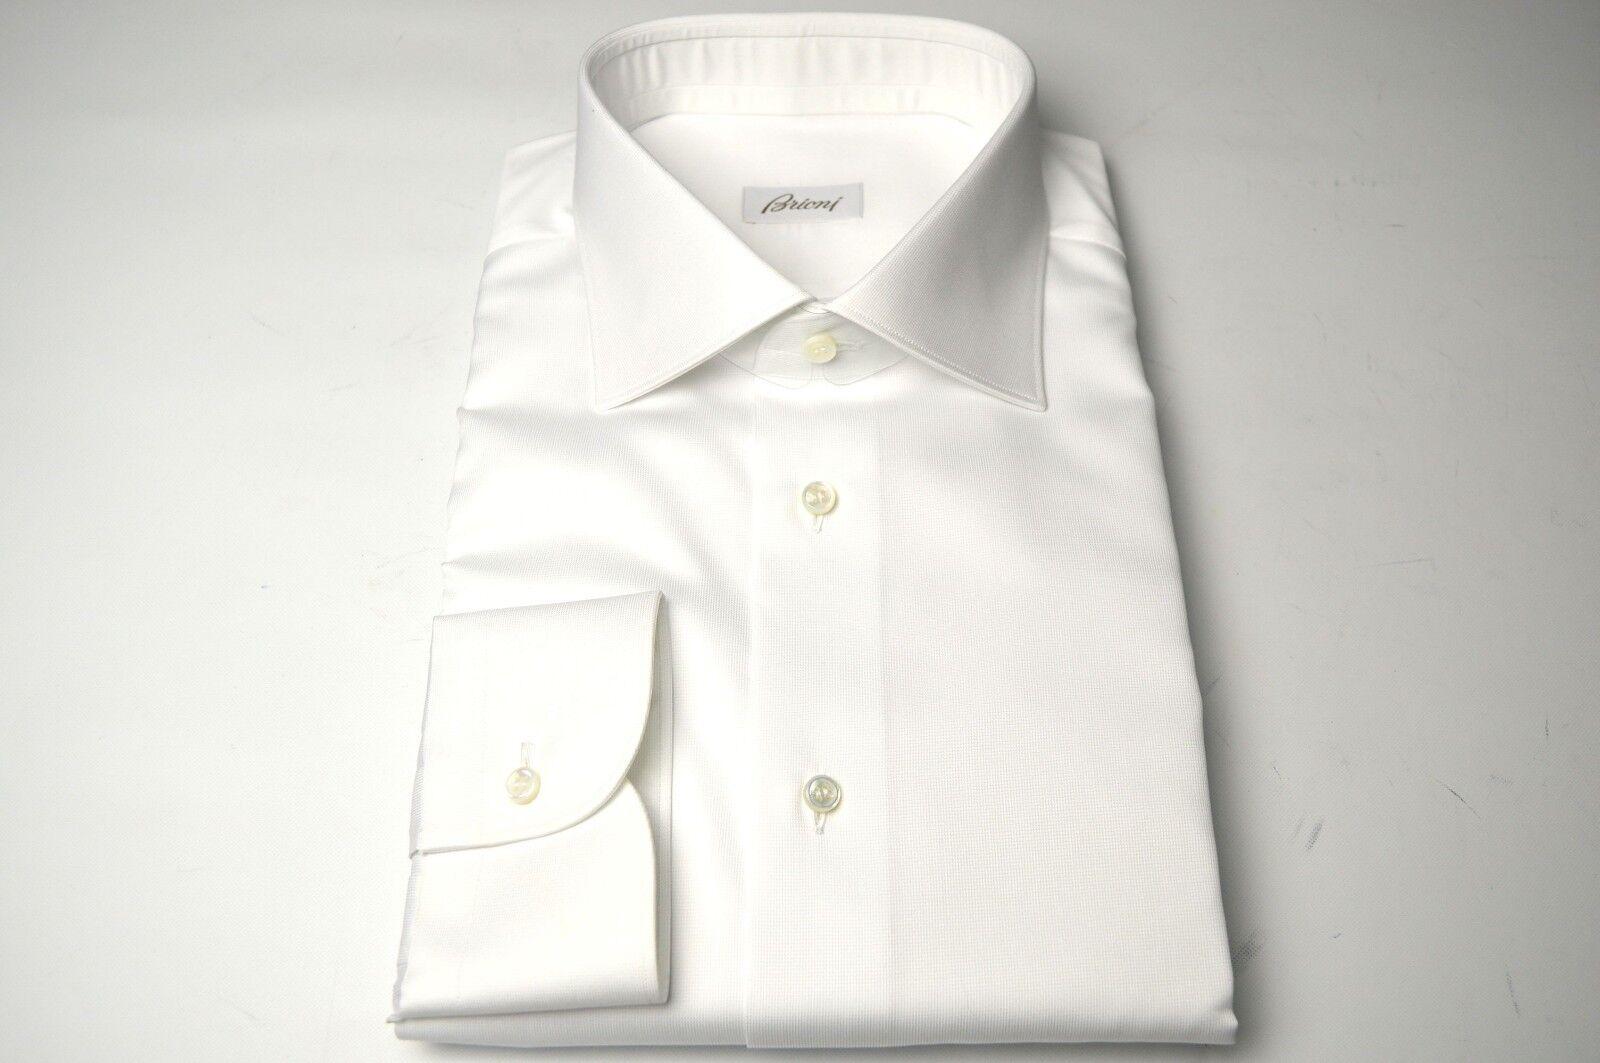 NEW  BRIONI Dress Weiß SHIRT 100% Cotton Größe 16.5 Us 42 Eu  (SE75)